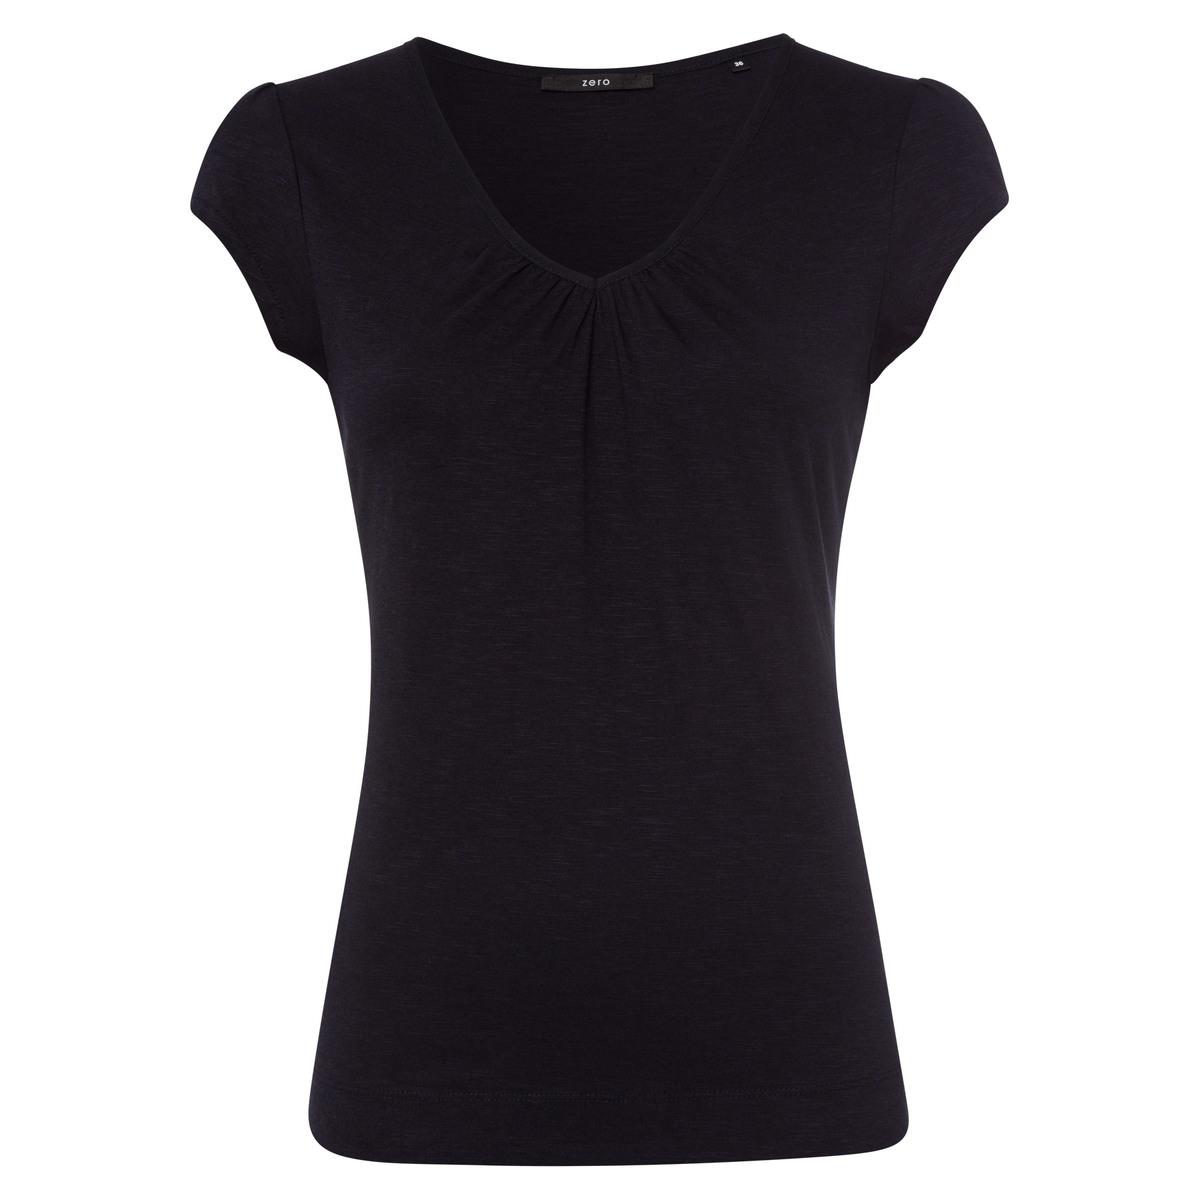 T-Shirt Valea mit gerafftem Ausschnitt in blue black